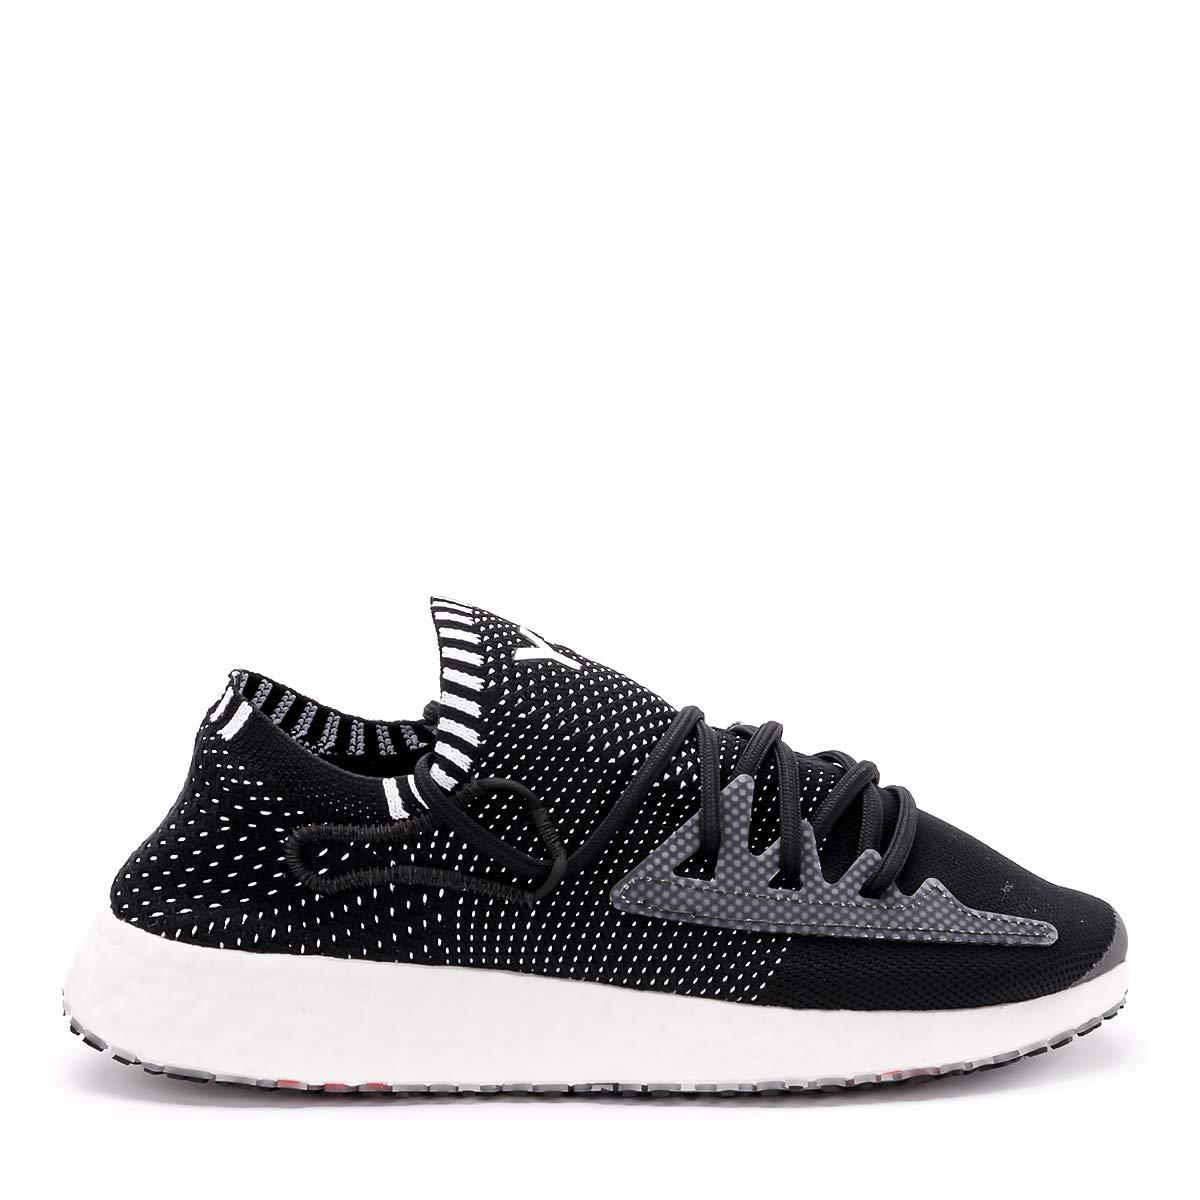 Black Y-3 Man's Raito Racer Black Primeknit Sneaker